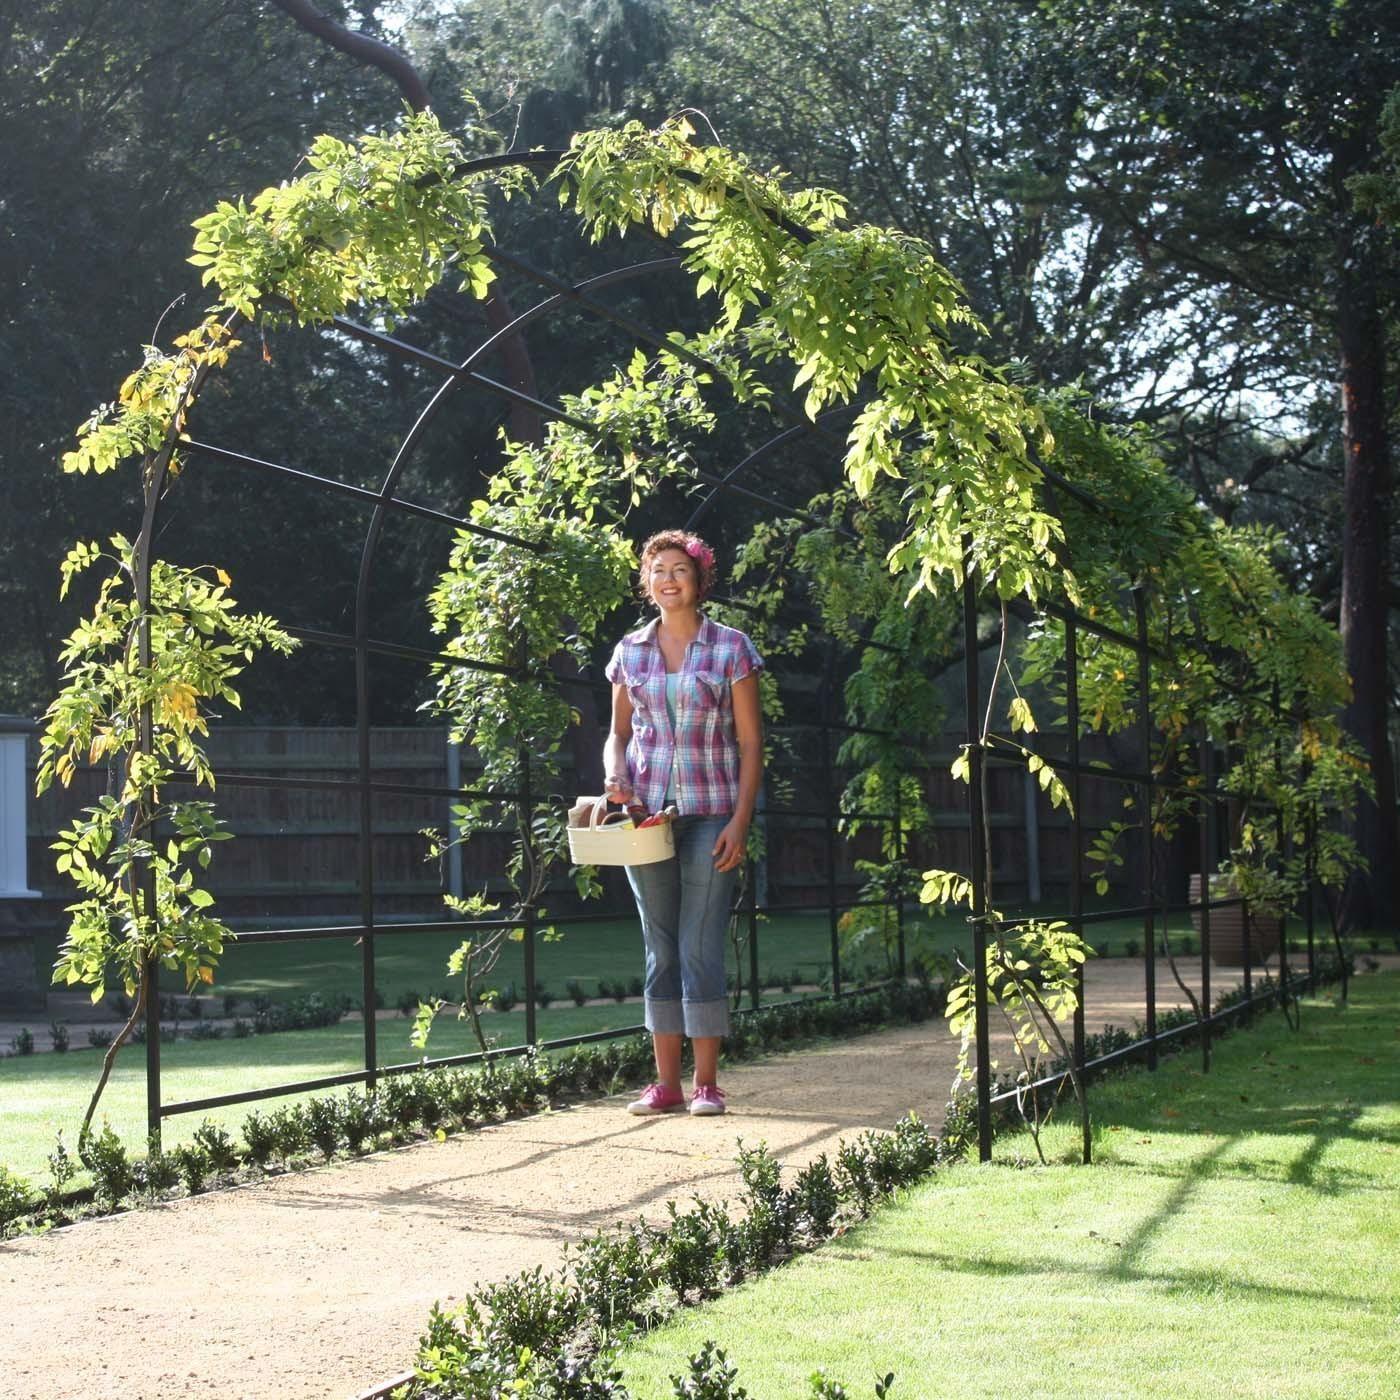 Roman Arch Garden Pergola   Harrod Horticultural (UK)